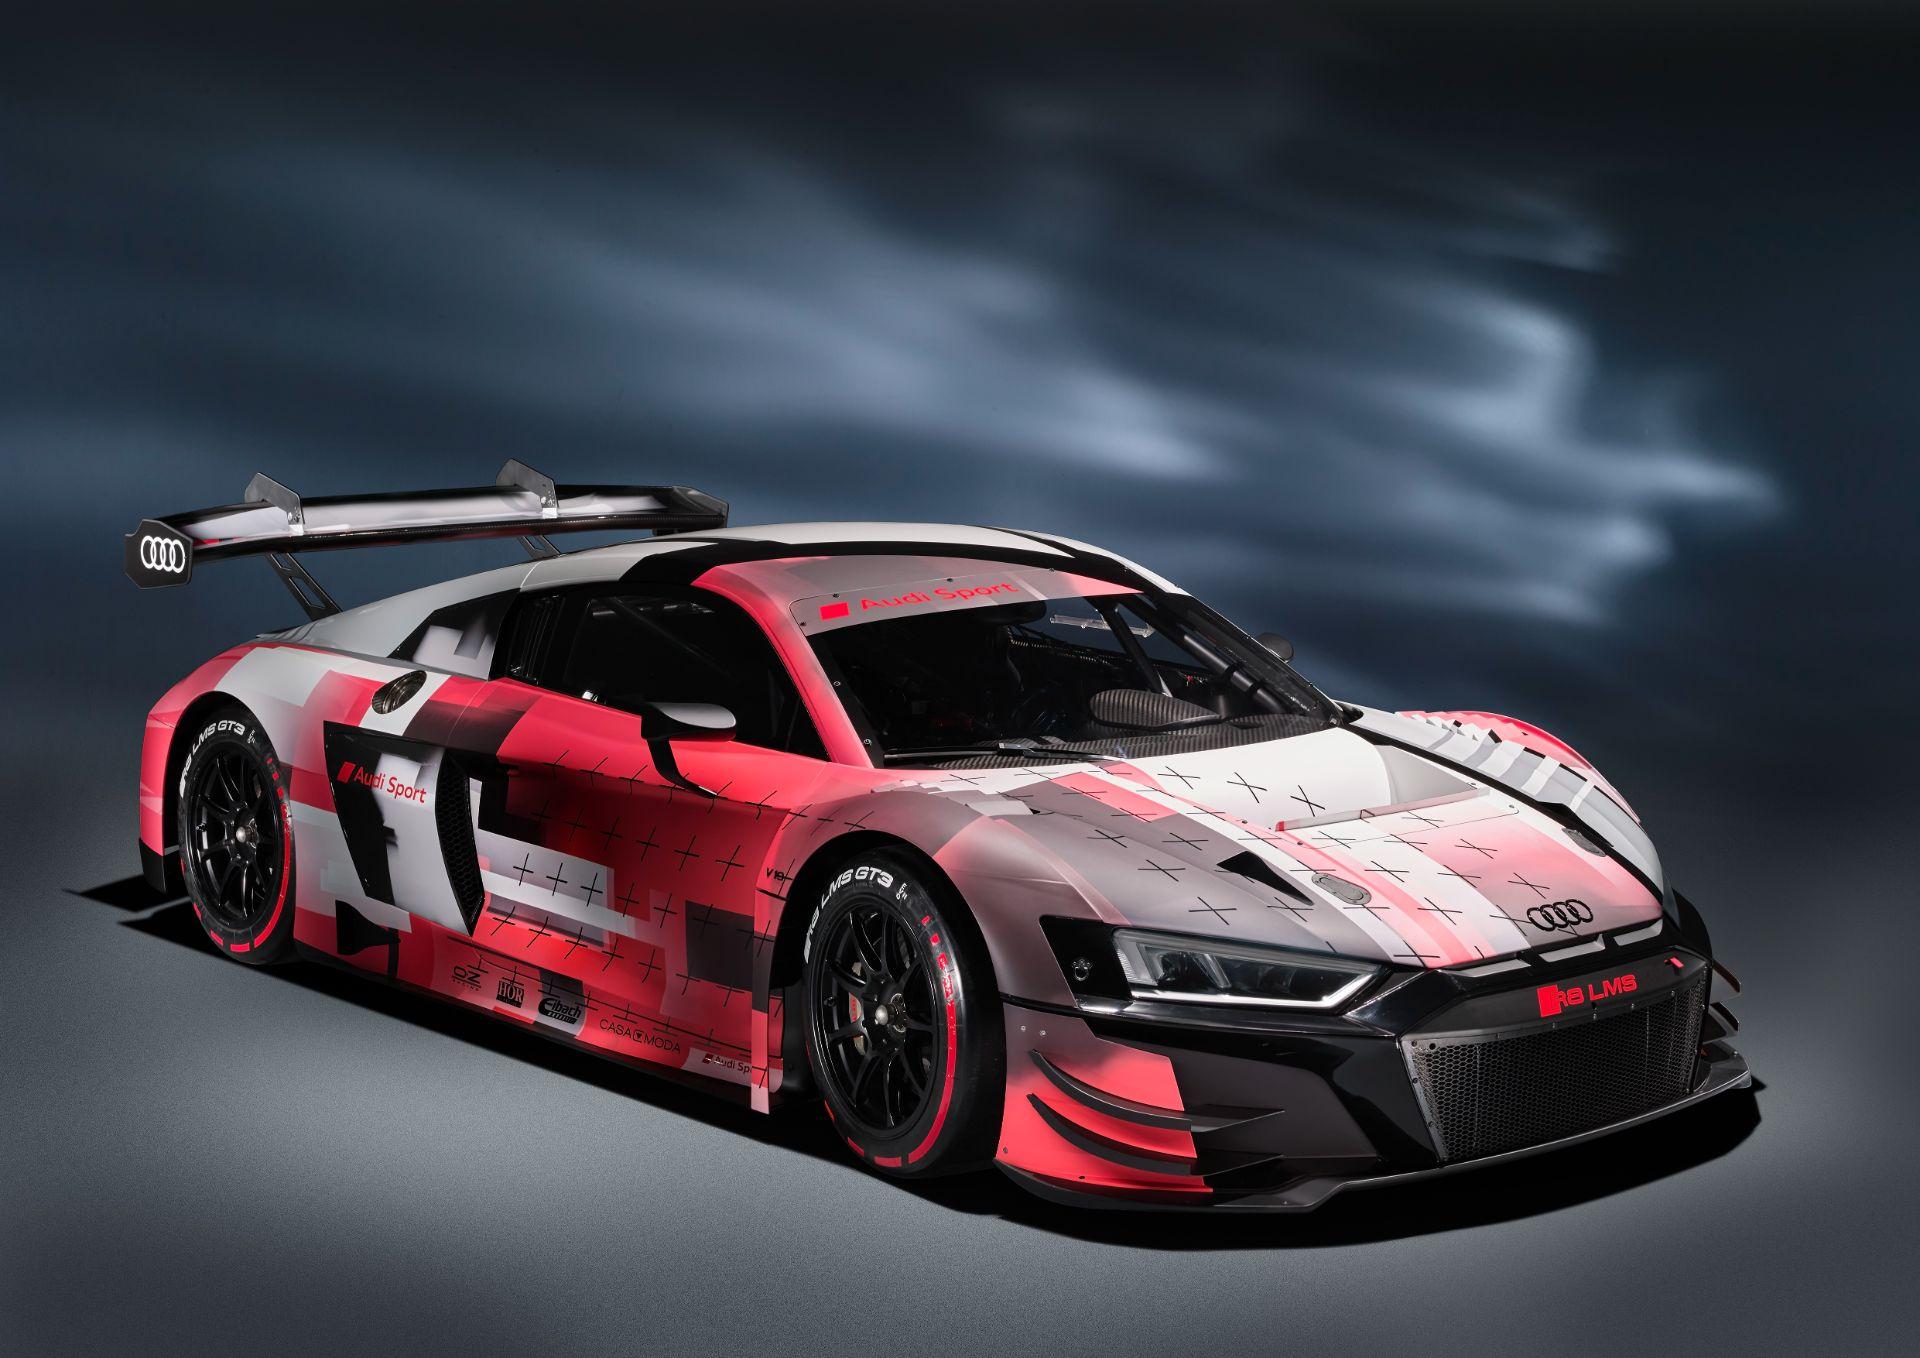 Audi-R8-LMS-GT3-Evo-II-2